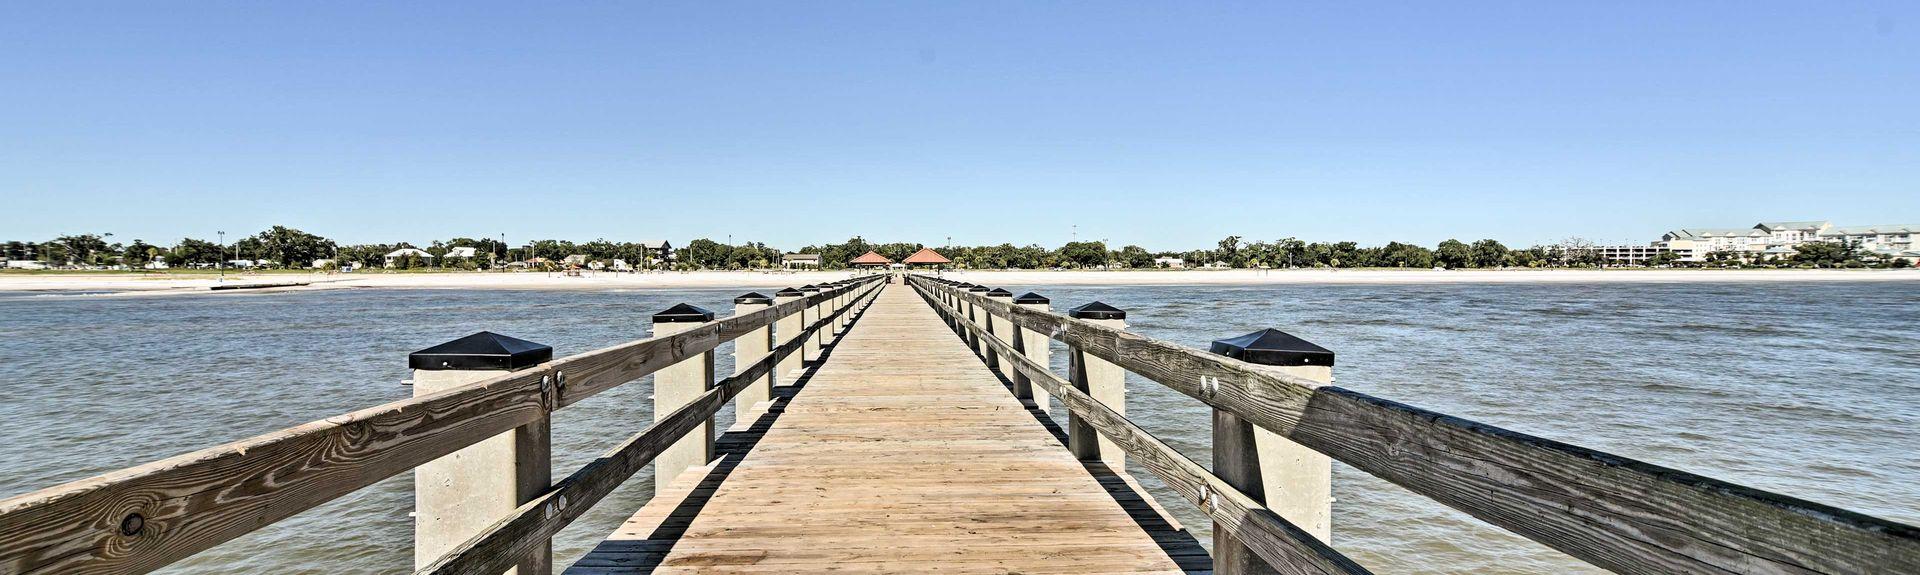 Buccaneer Bay Waterpark, Waveland, MS, USA